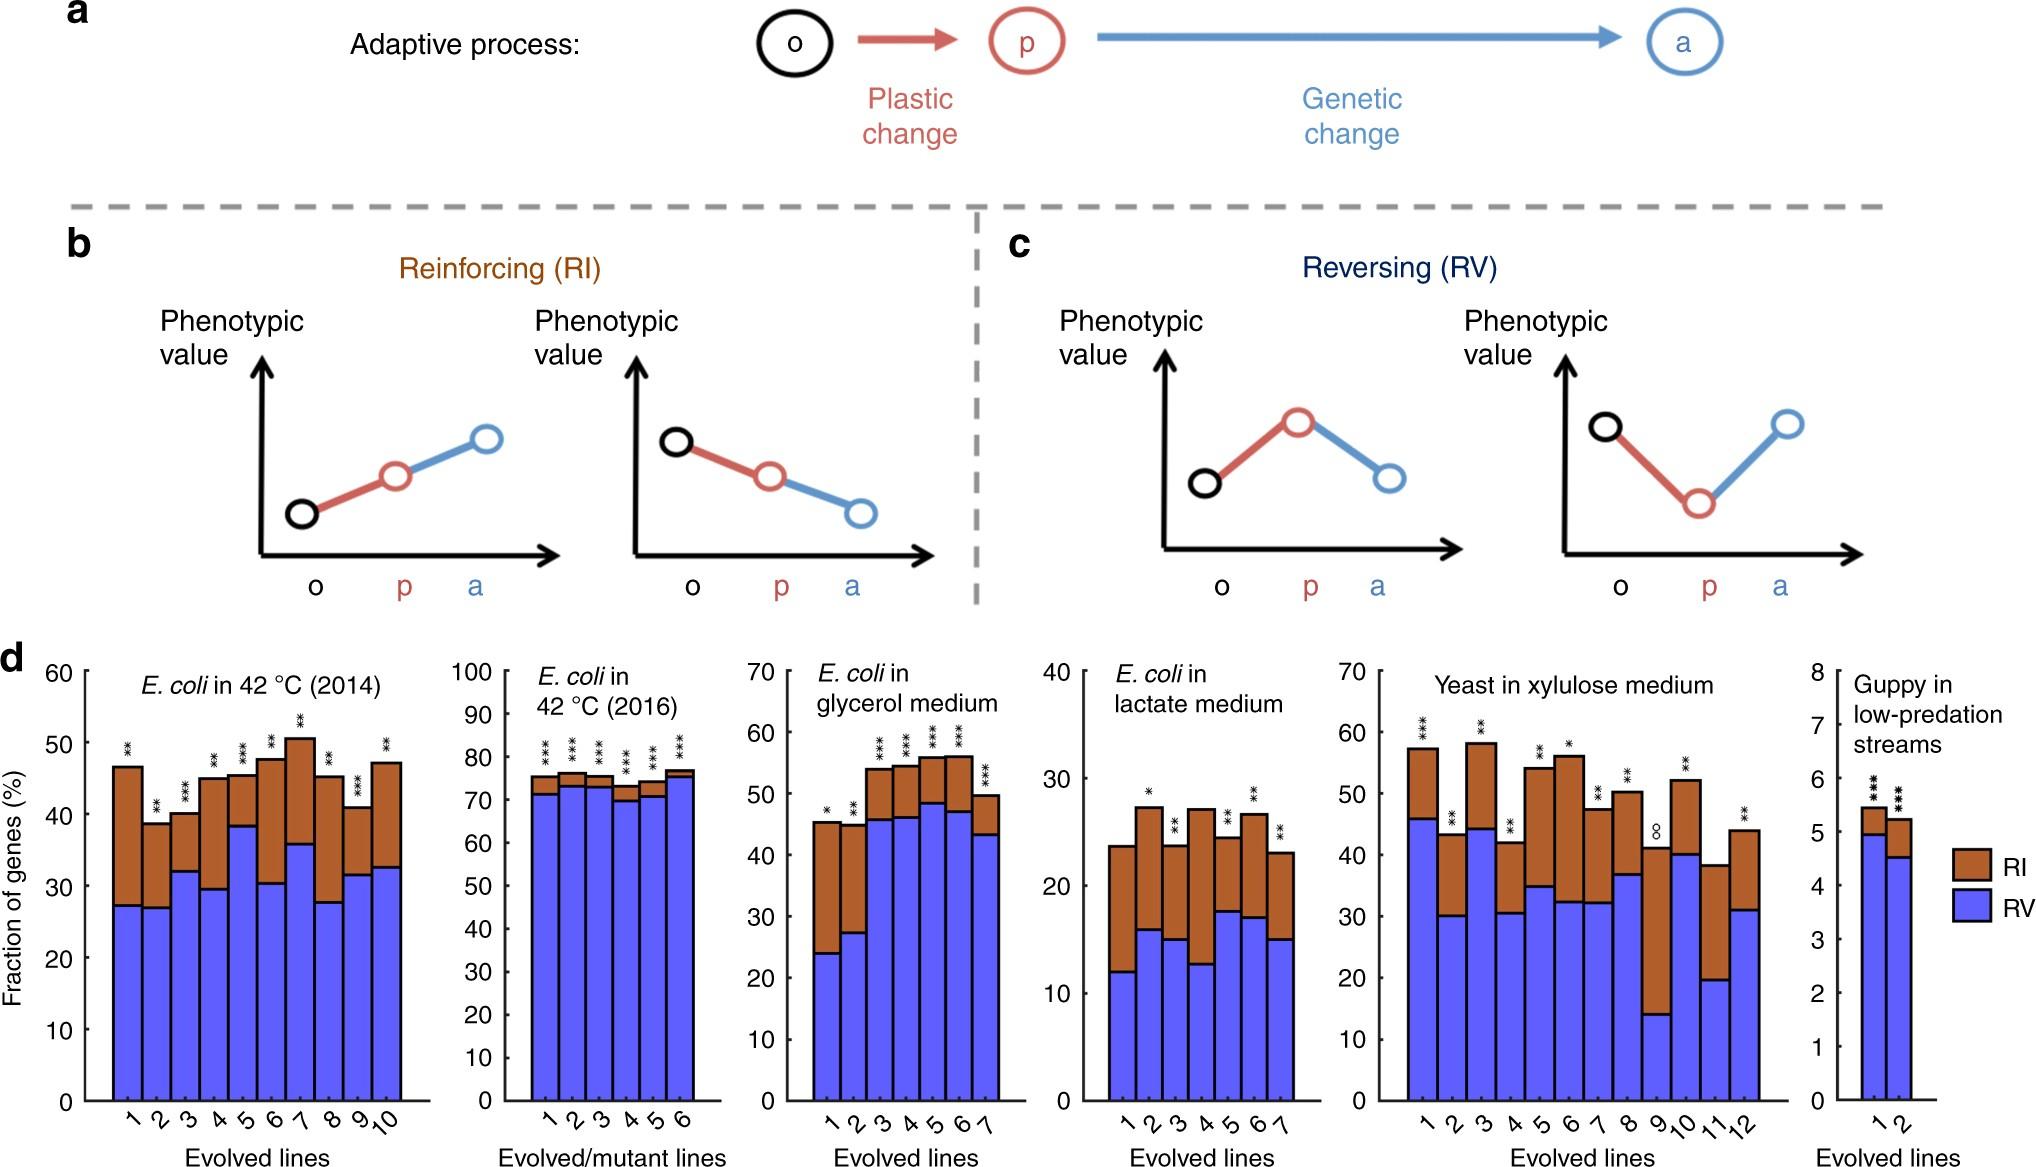 Evolutionary Adaptations To New Environments Generally Reverse